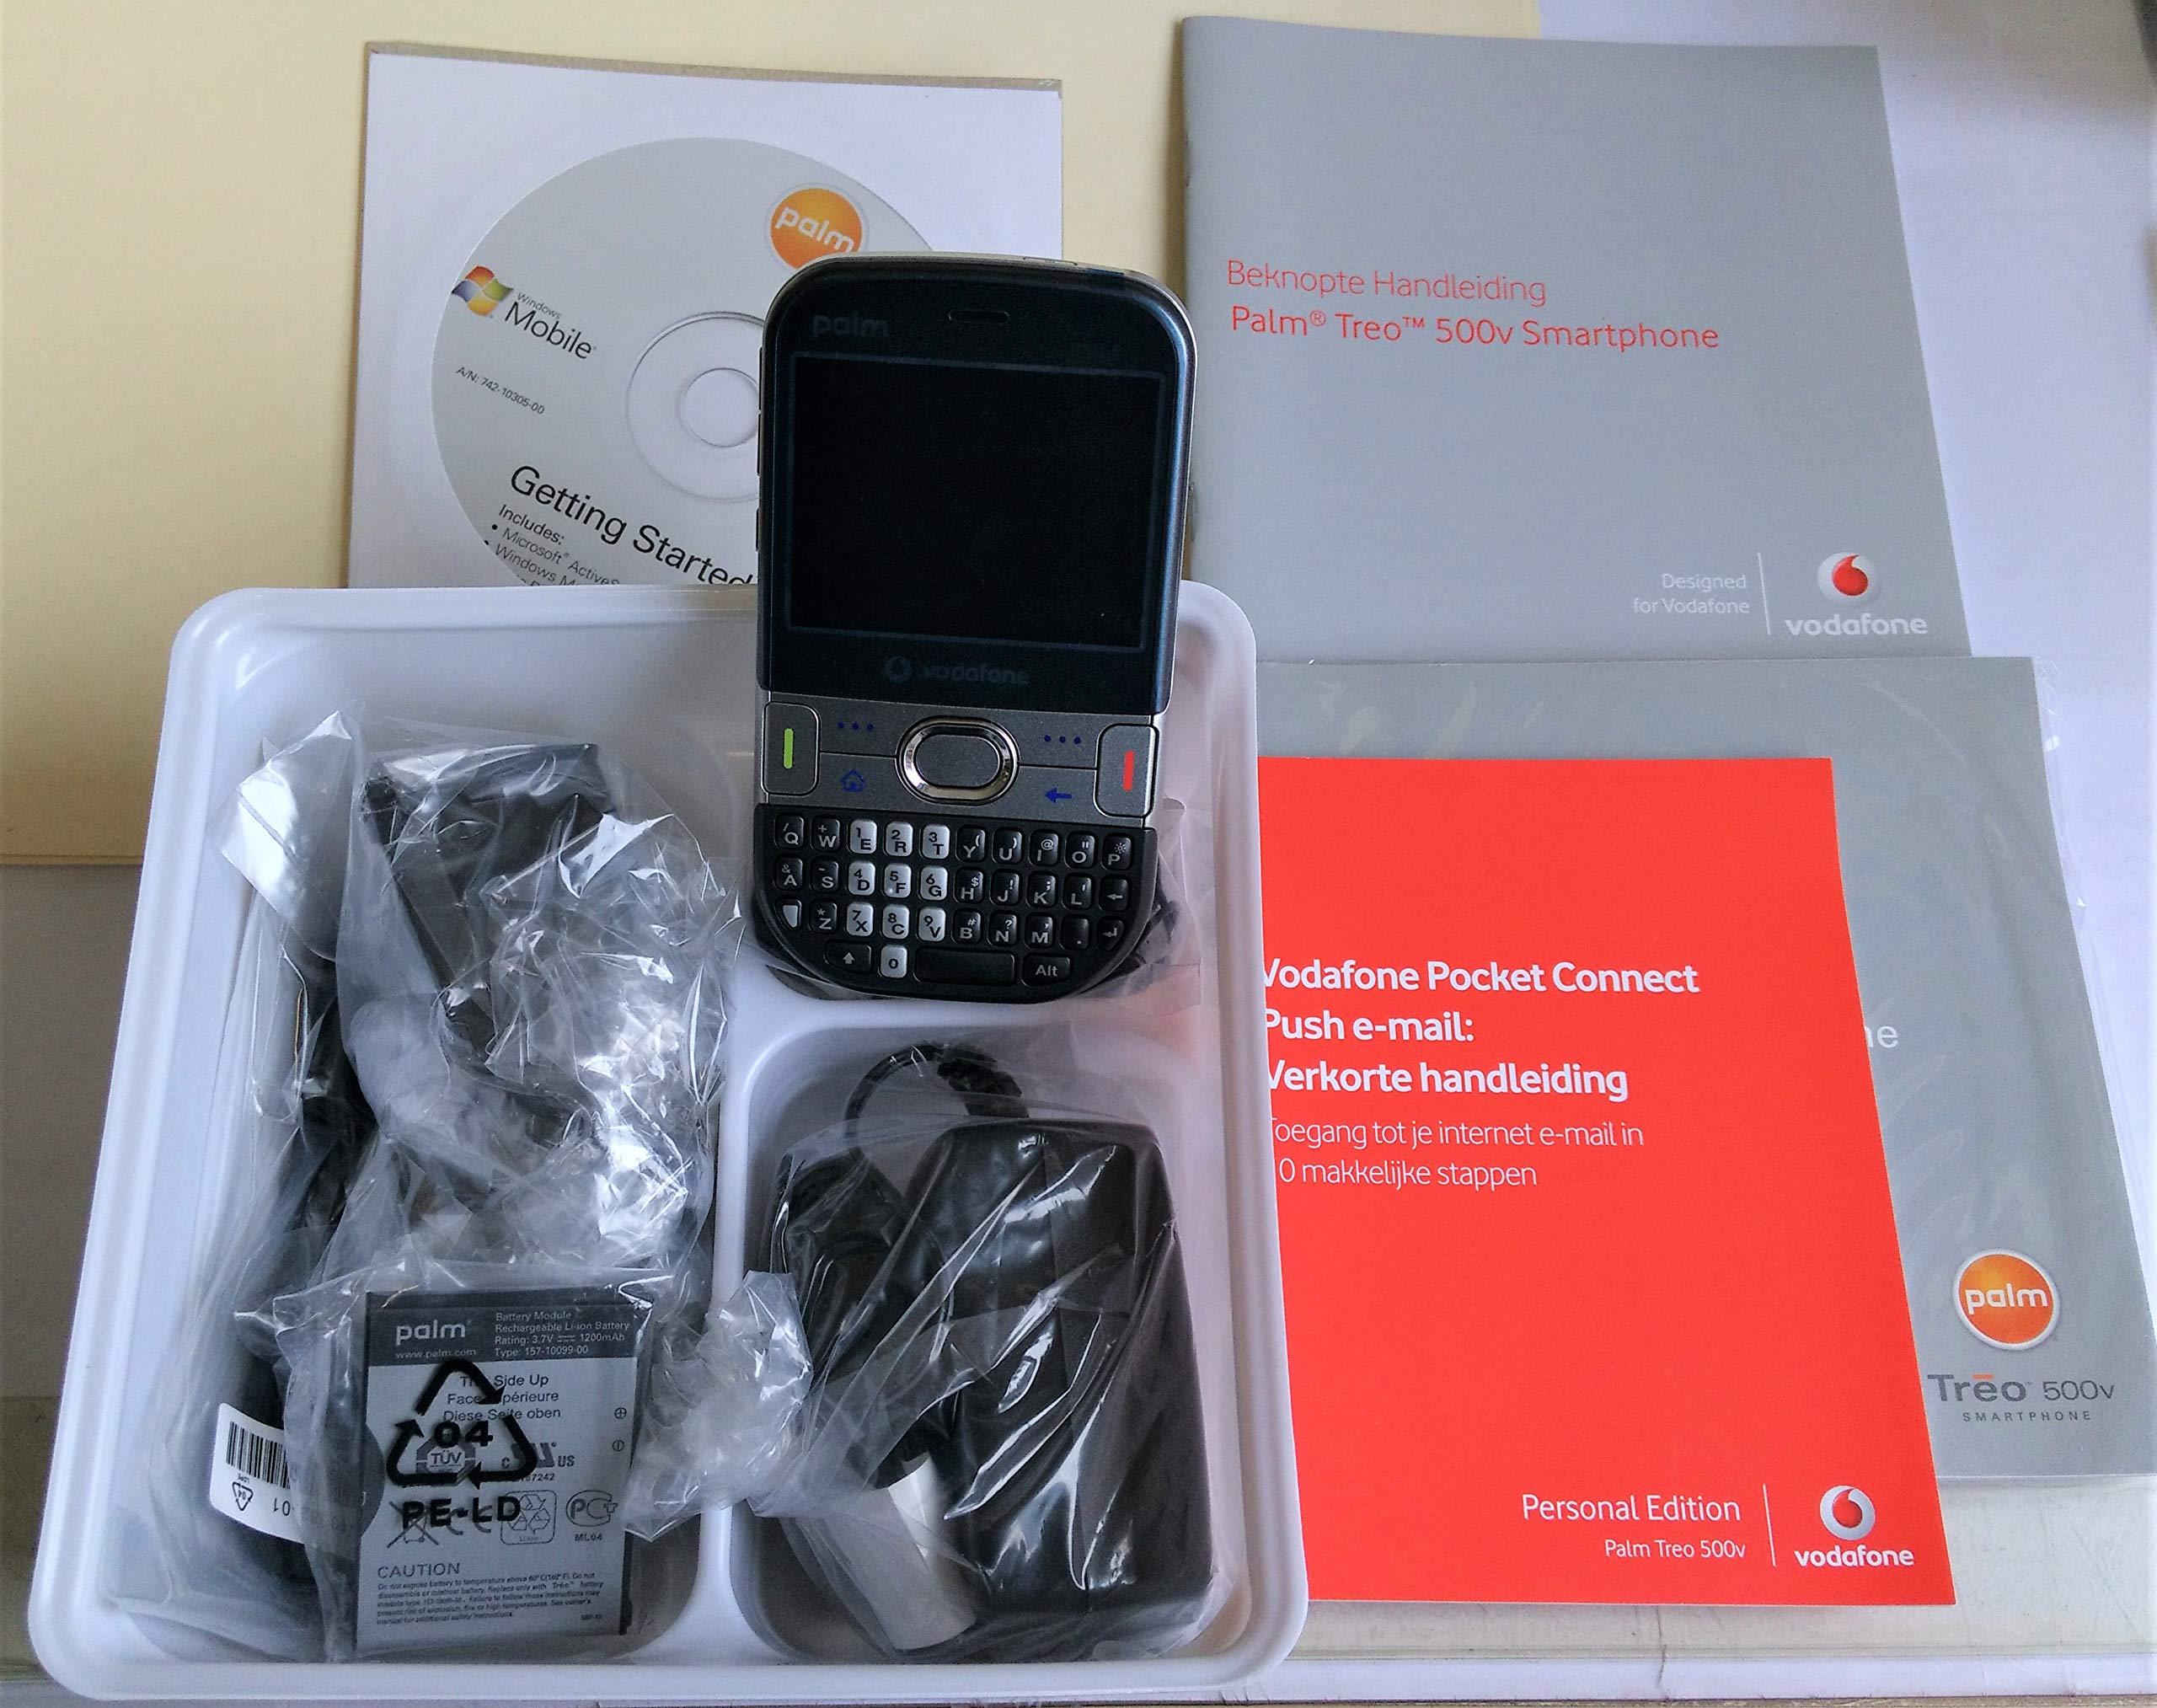 Palm Treo 500 V Smartphone, con Vodafone BRAN Ding: Amazon.es ...